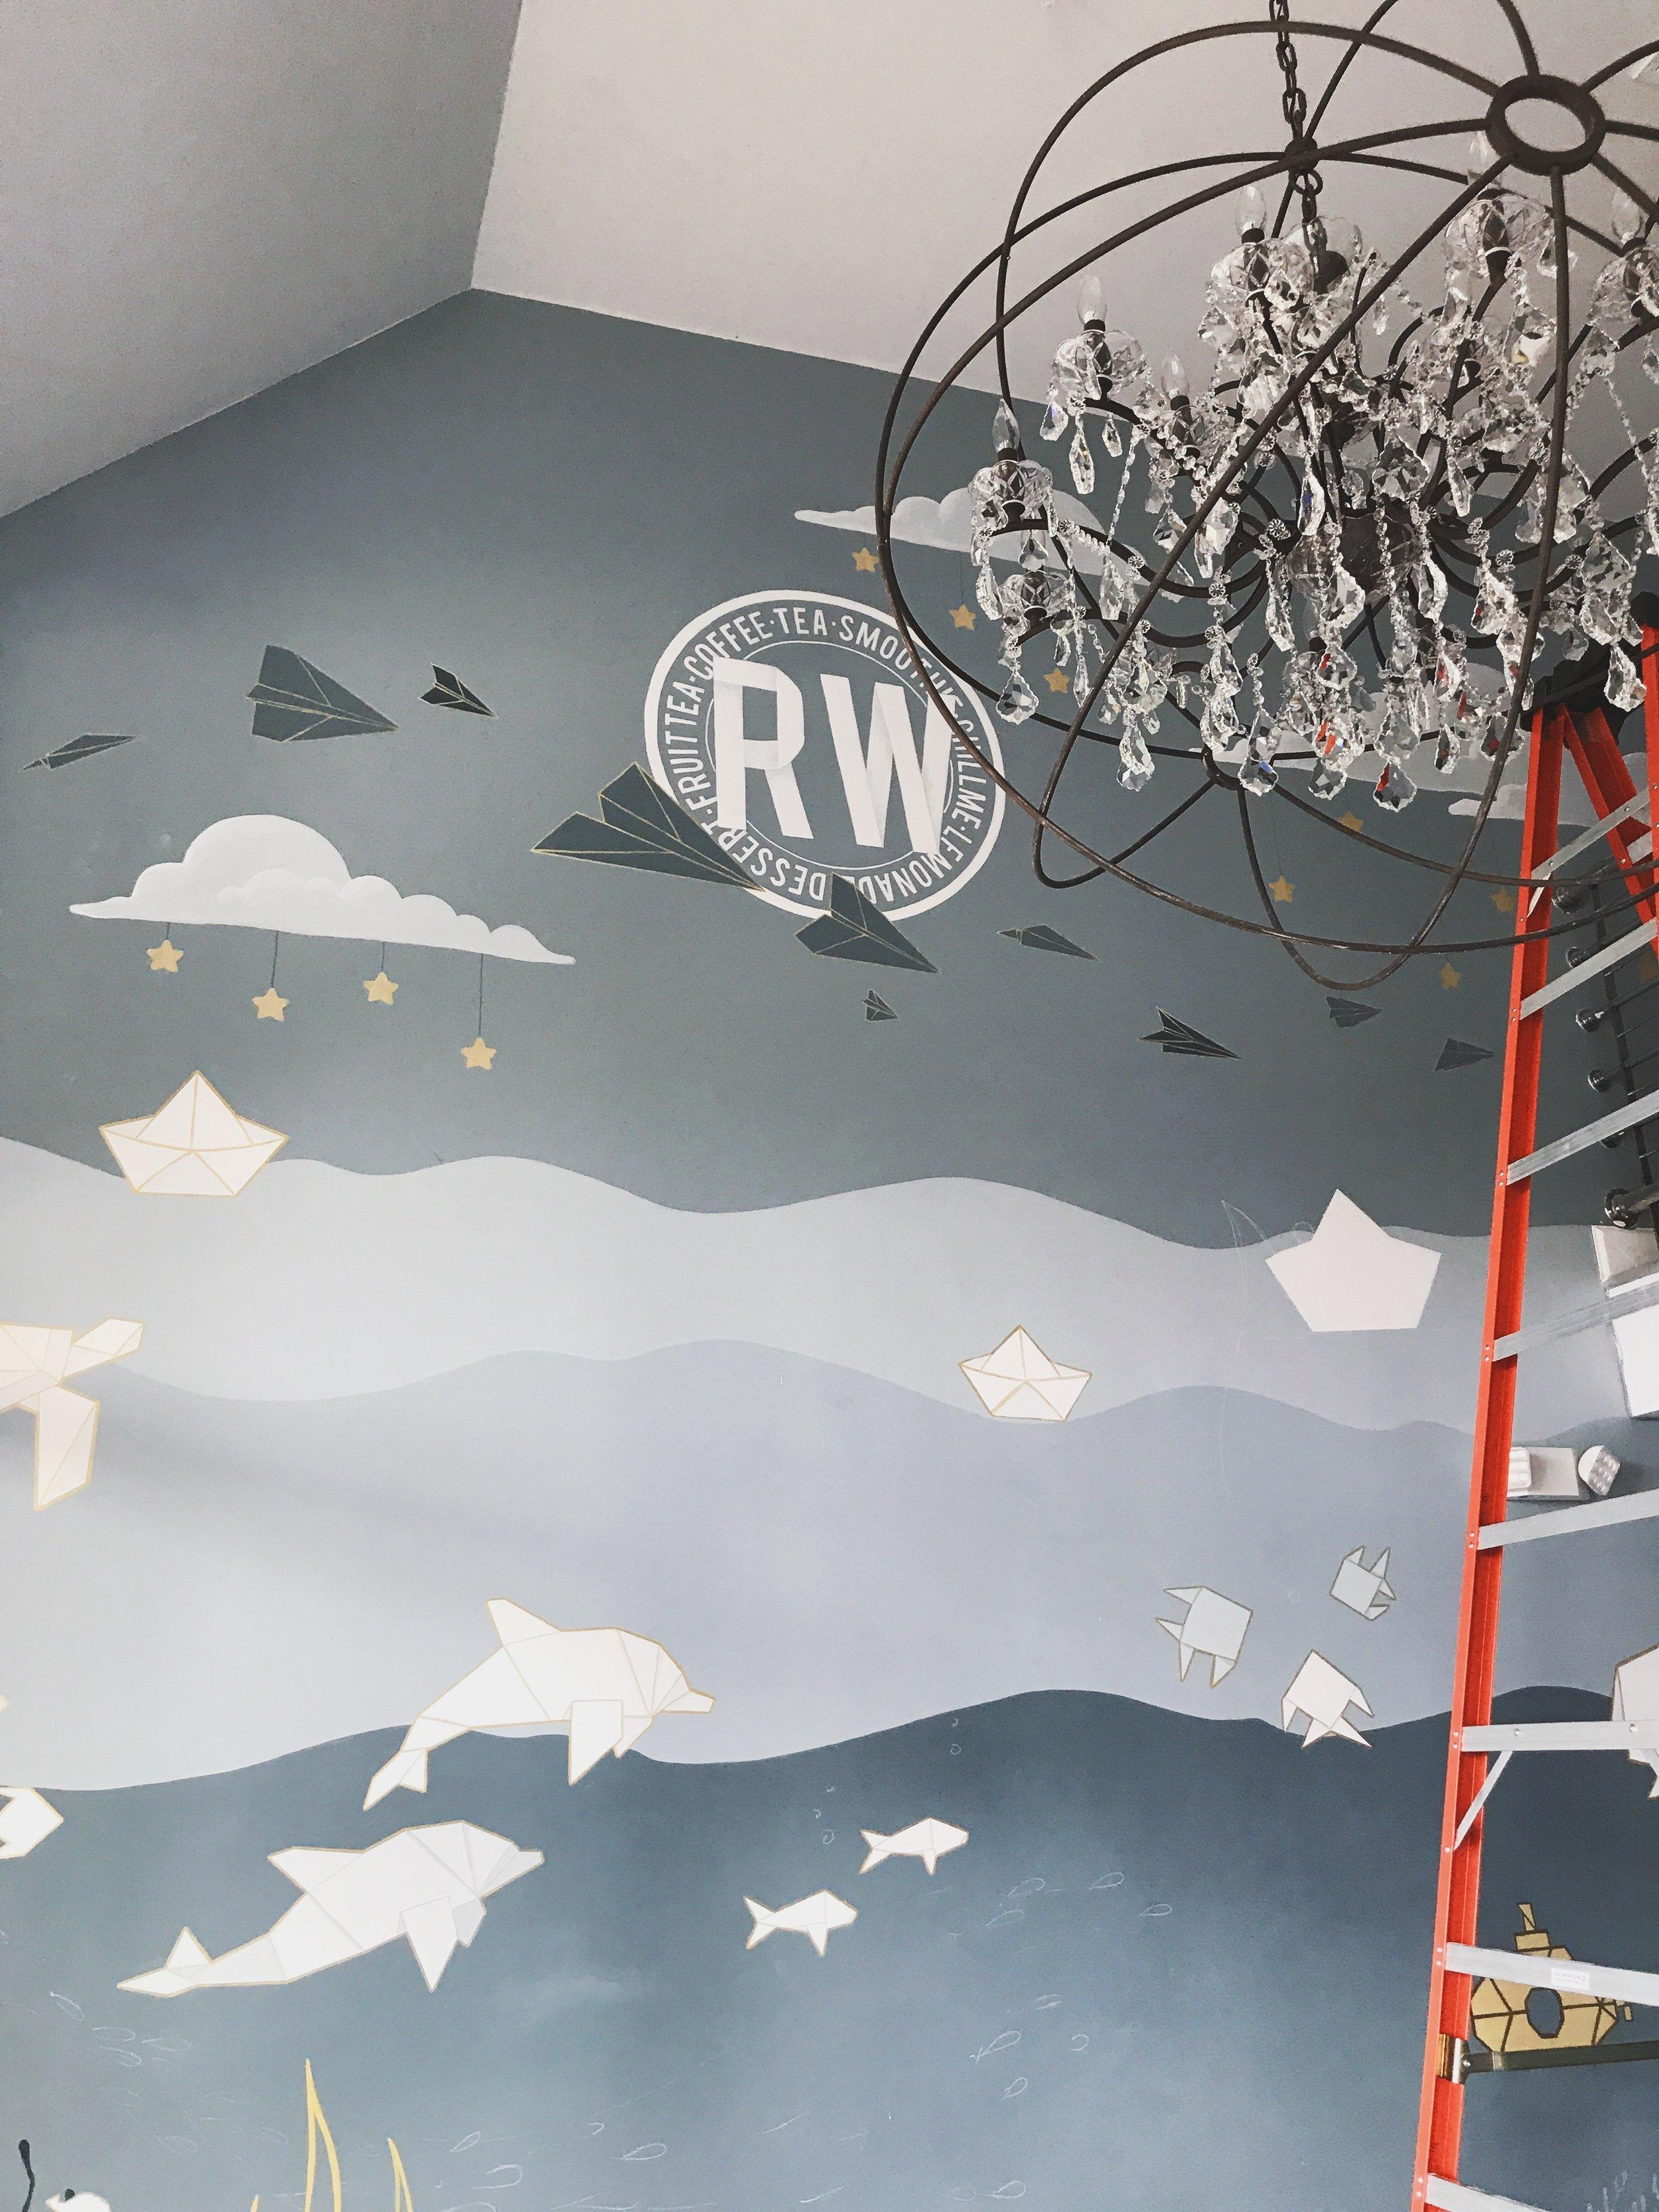 hello-airie-studios-roasting-water-huntington-beach-origami-ocean-mural.JPG